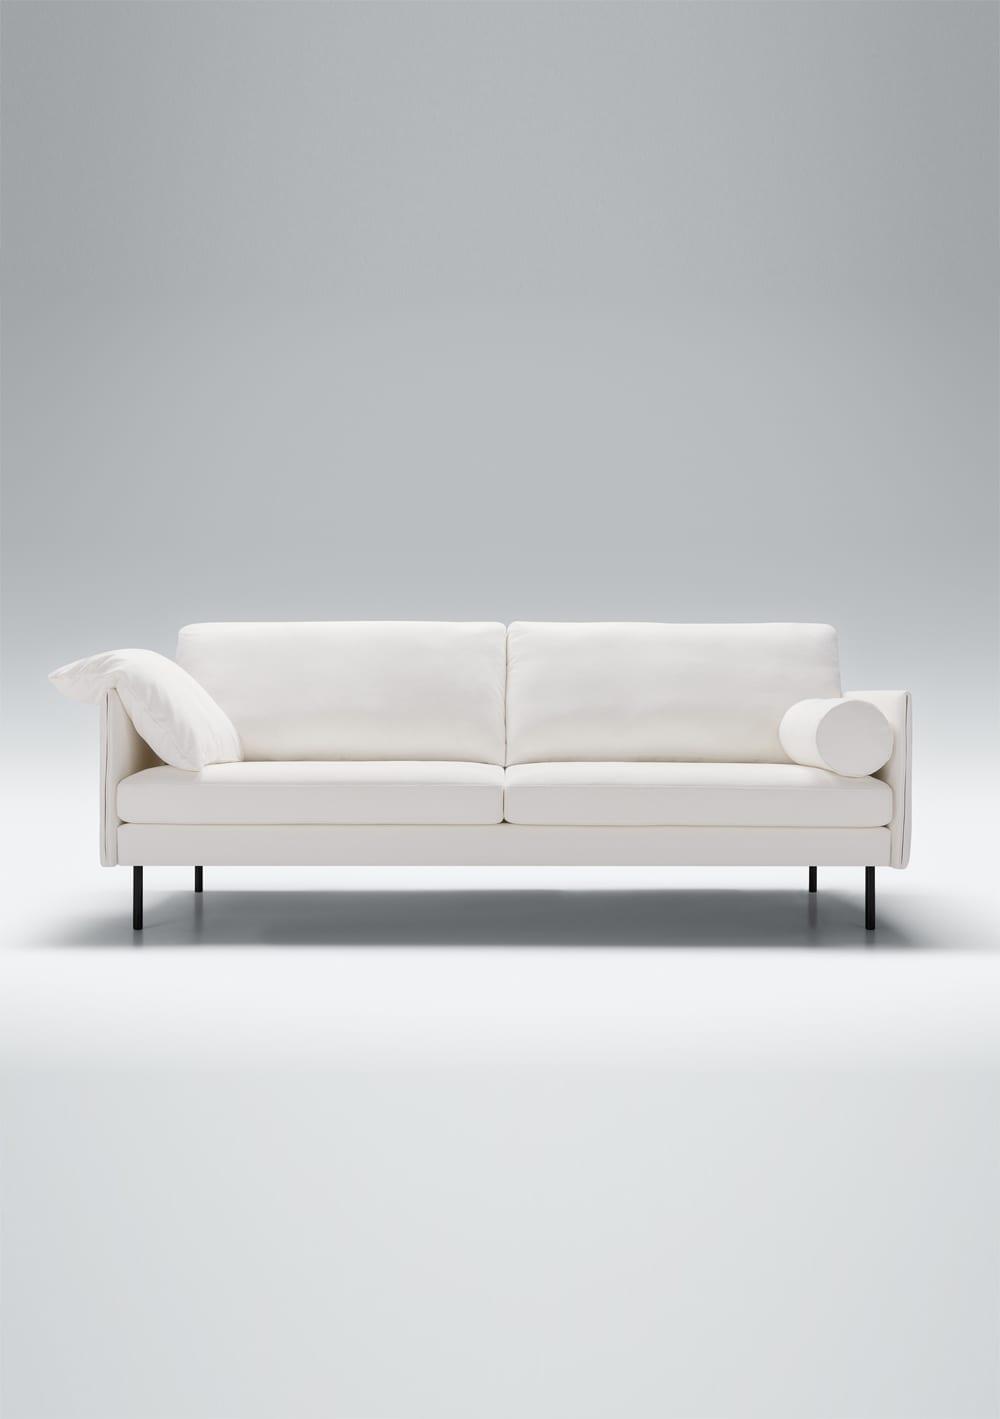 sits_sofa_juno_5